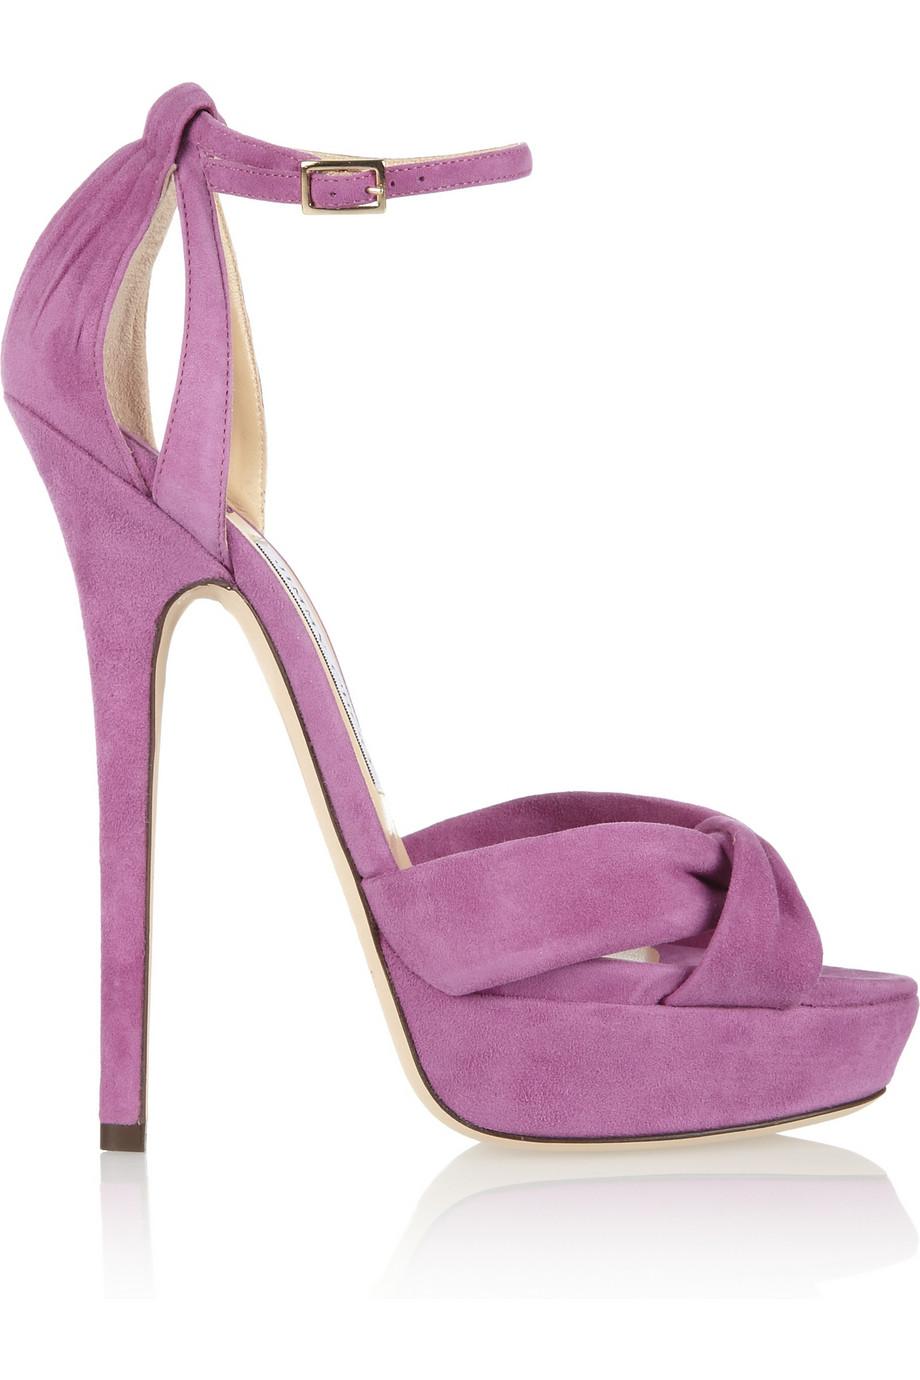 Lavender sandals shoes - Gallery